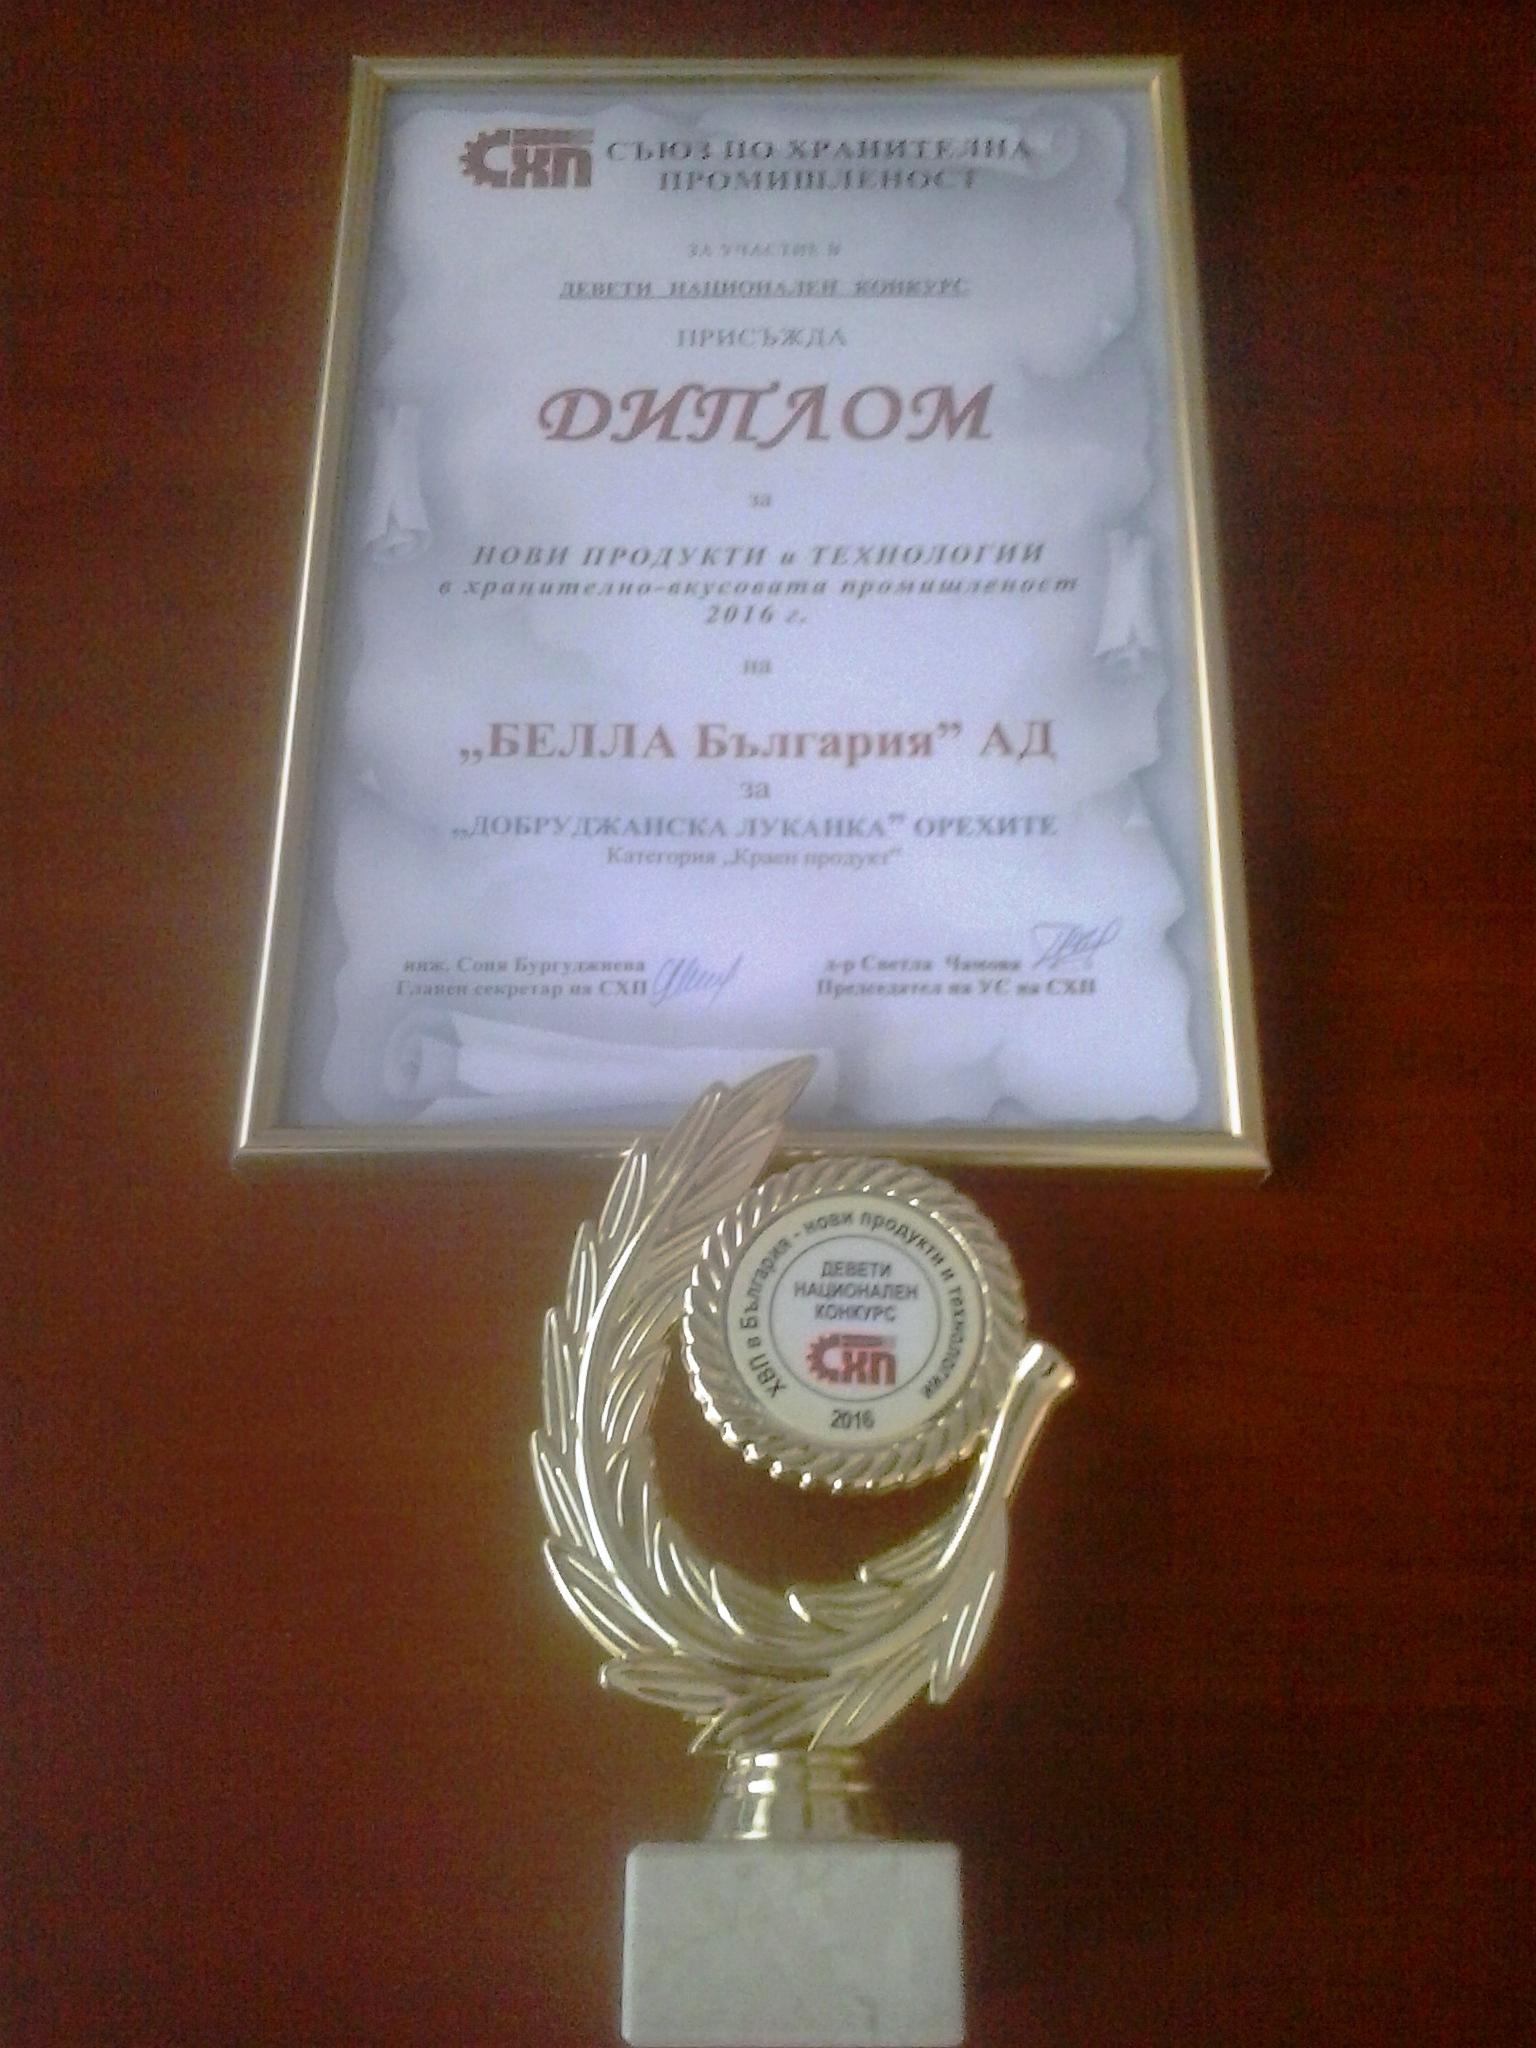 Orehite Dobrudjanska lukanka with honors from UFI, 2016.